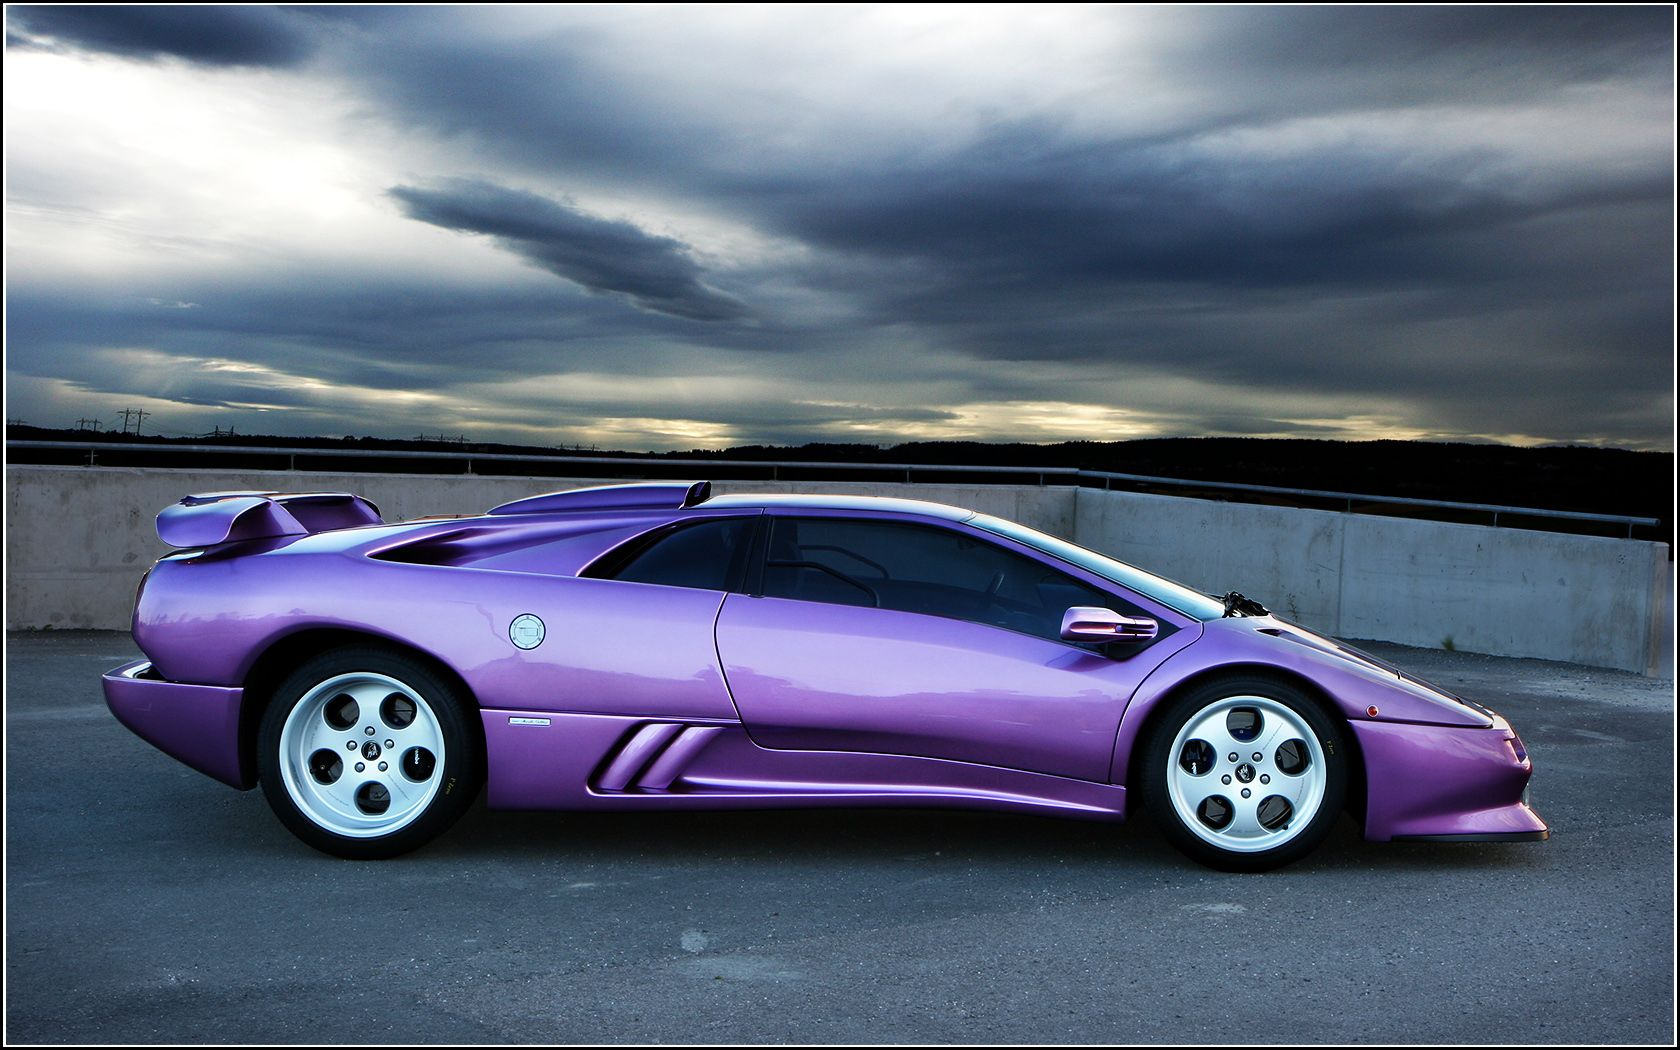 1992 Lamborghini Diablo SV (Like the Countach, but with ...